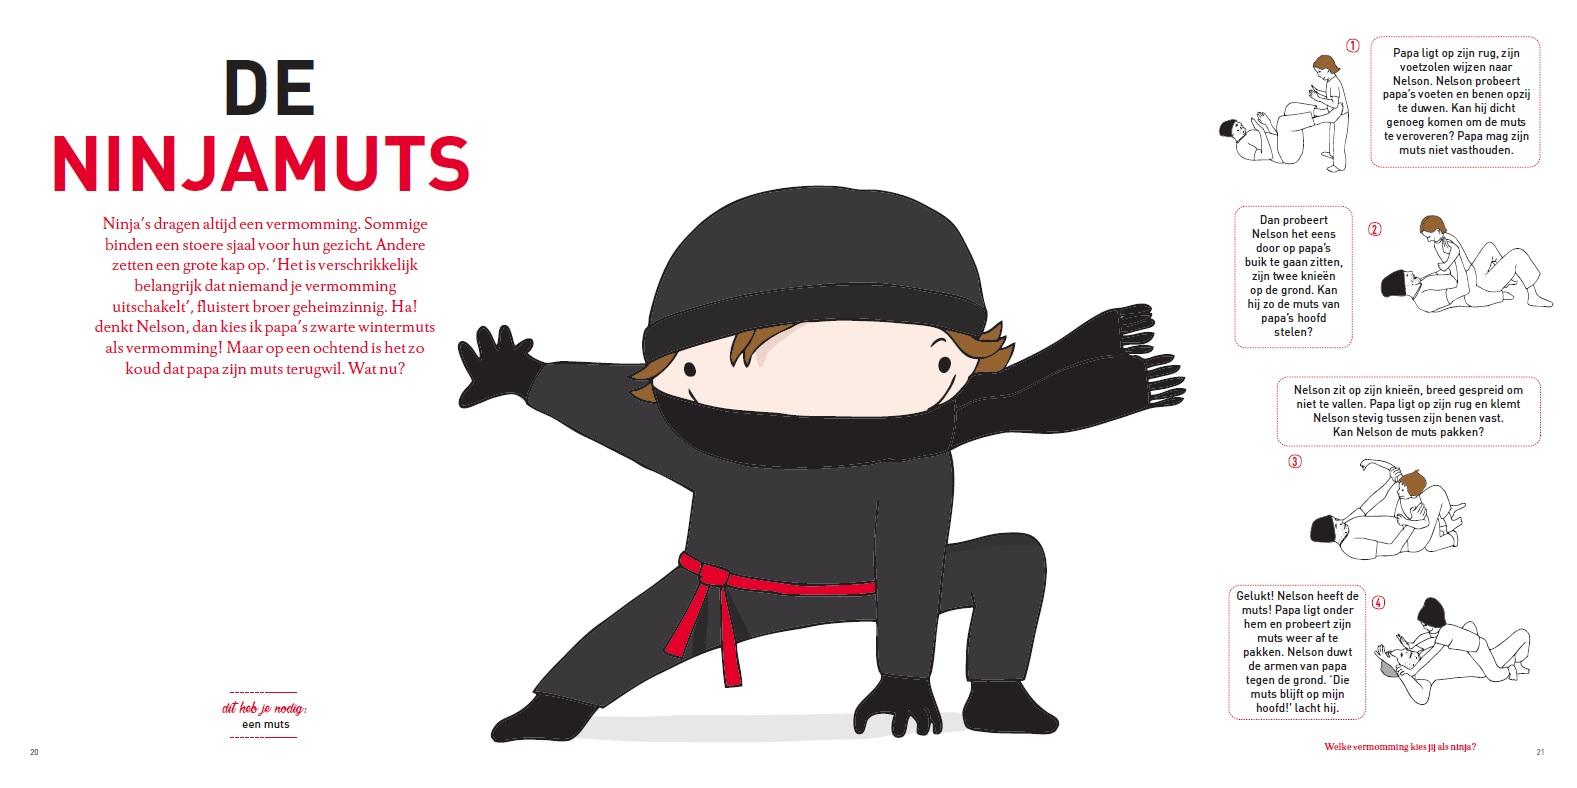 Ninjamuts